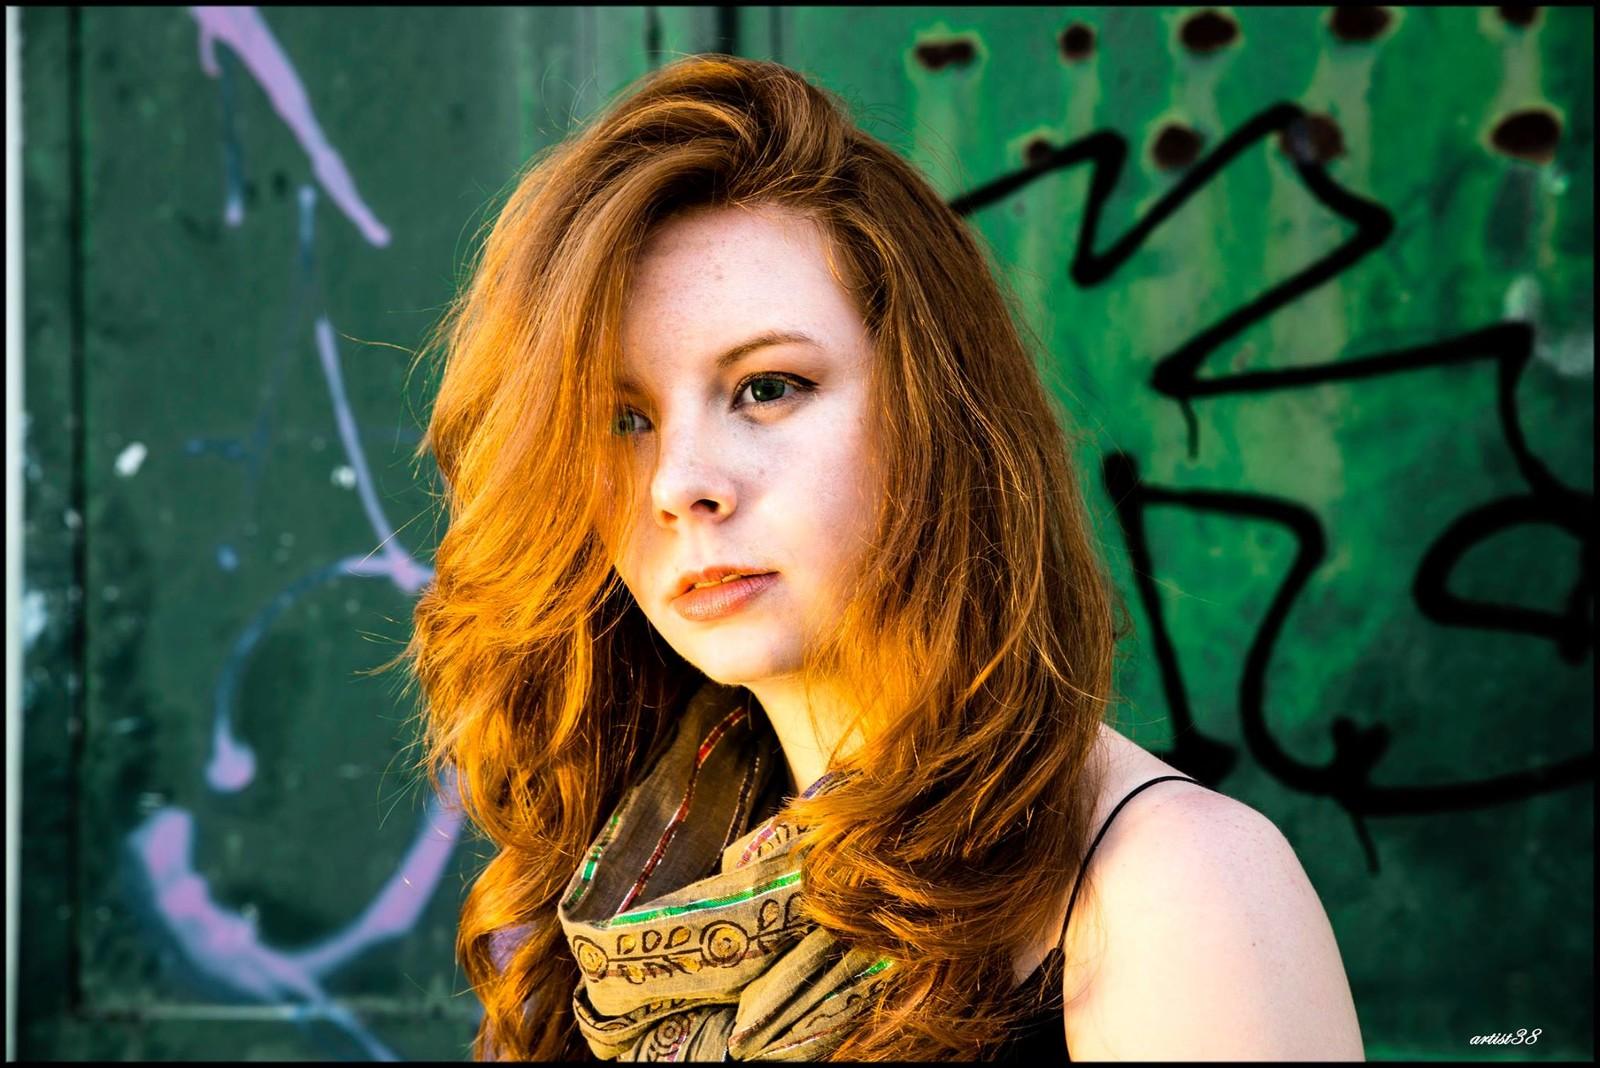 Femme photographe cherche modeles